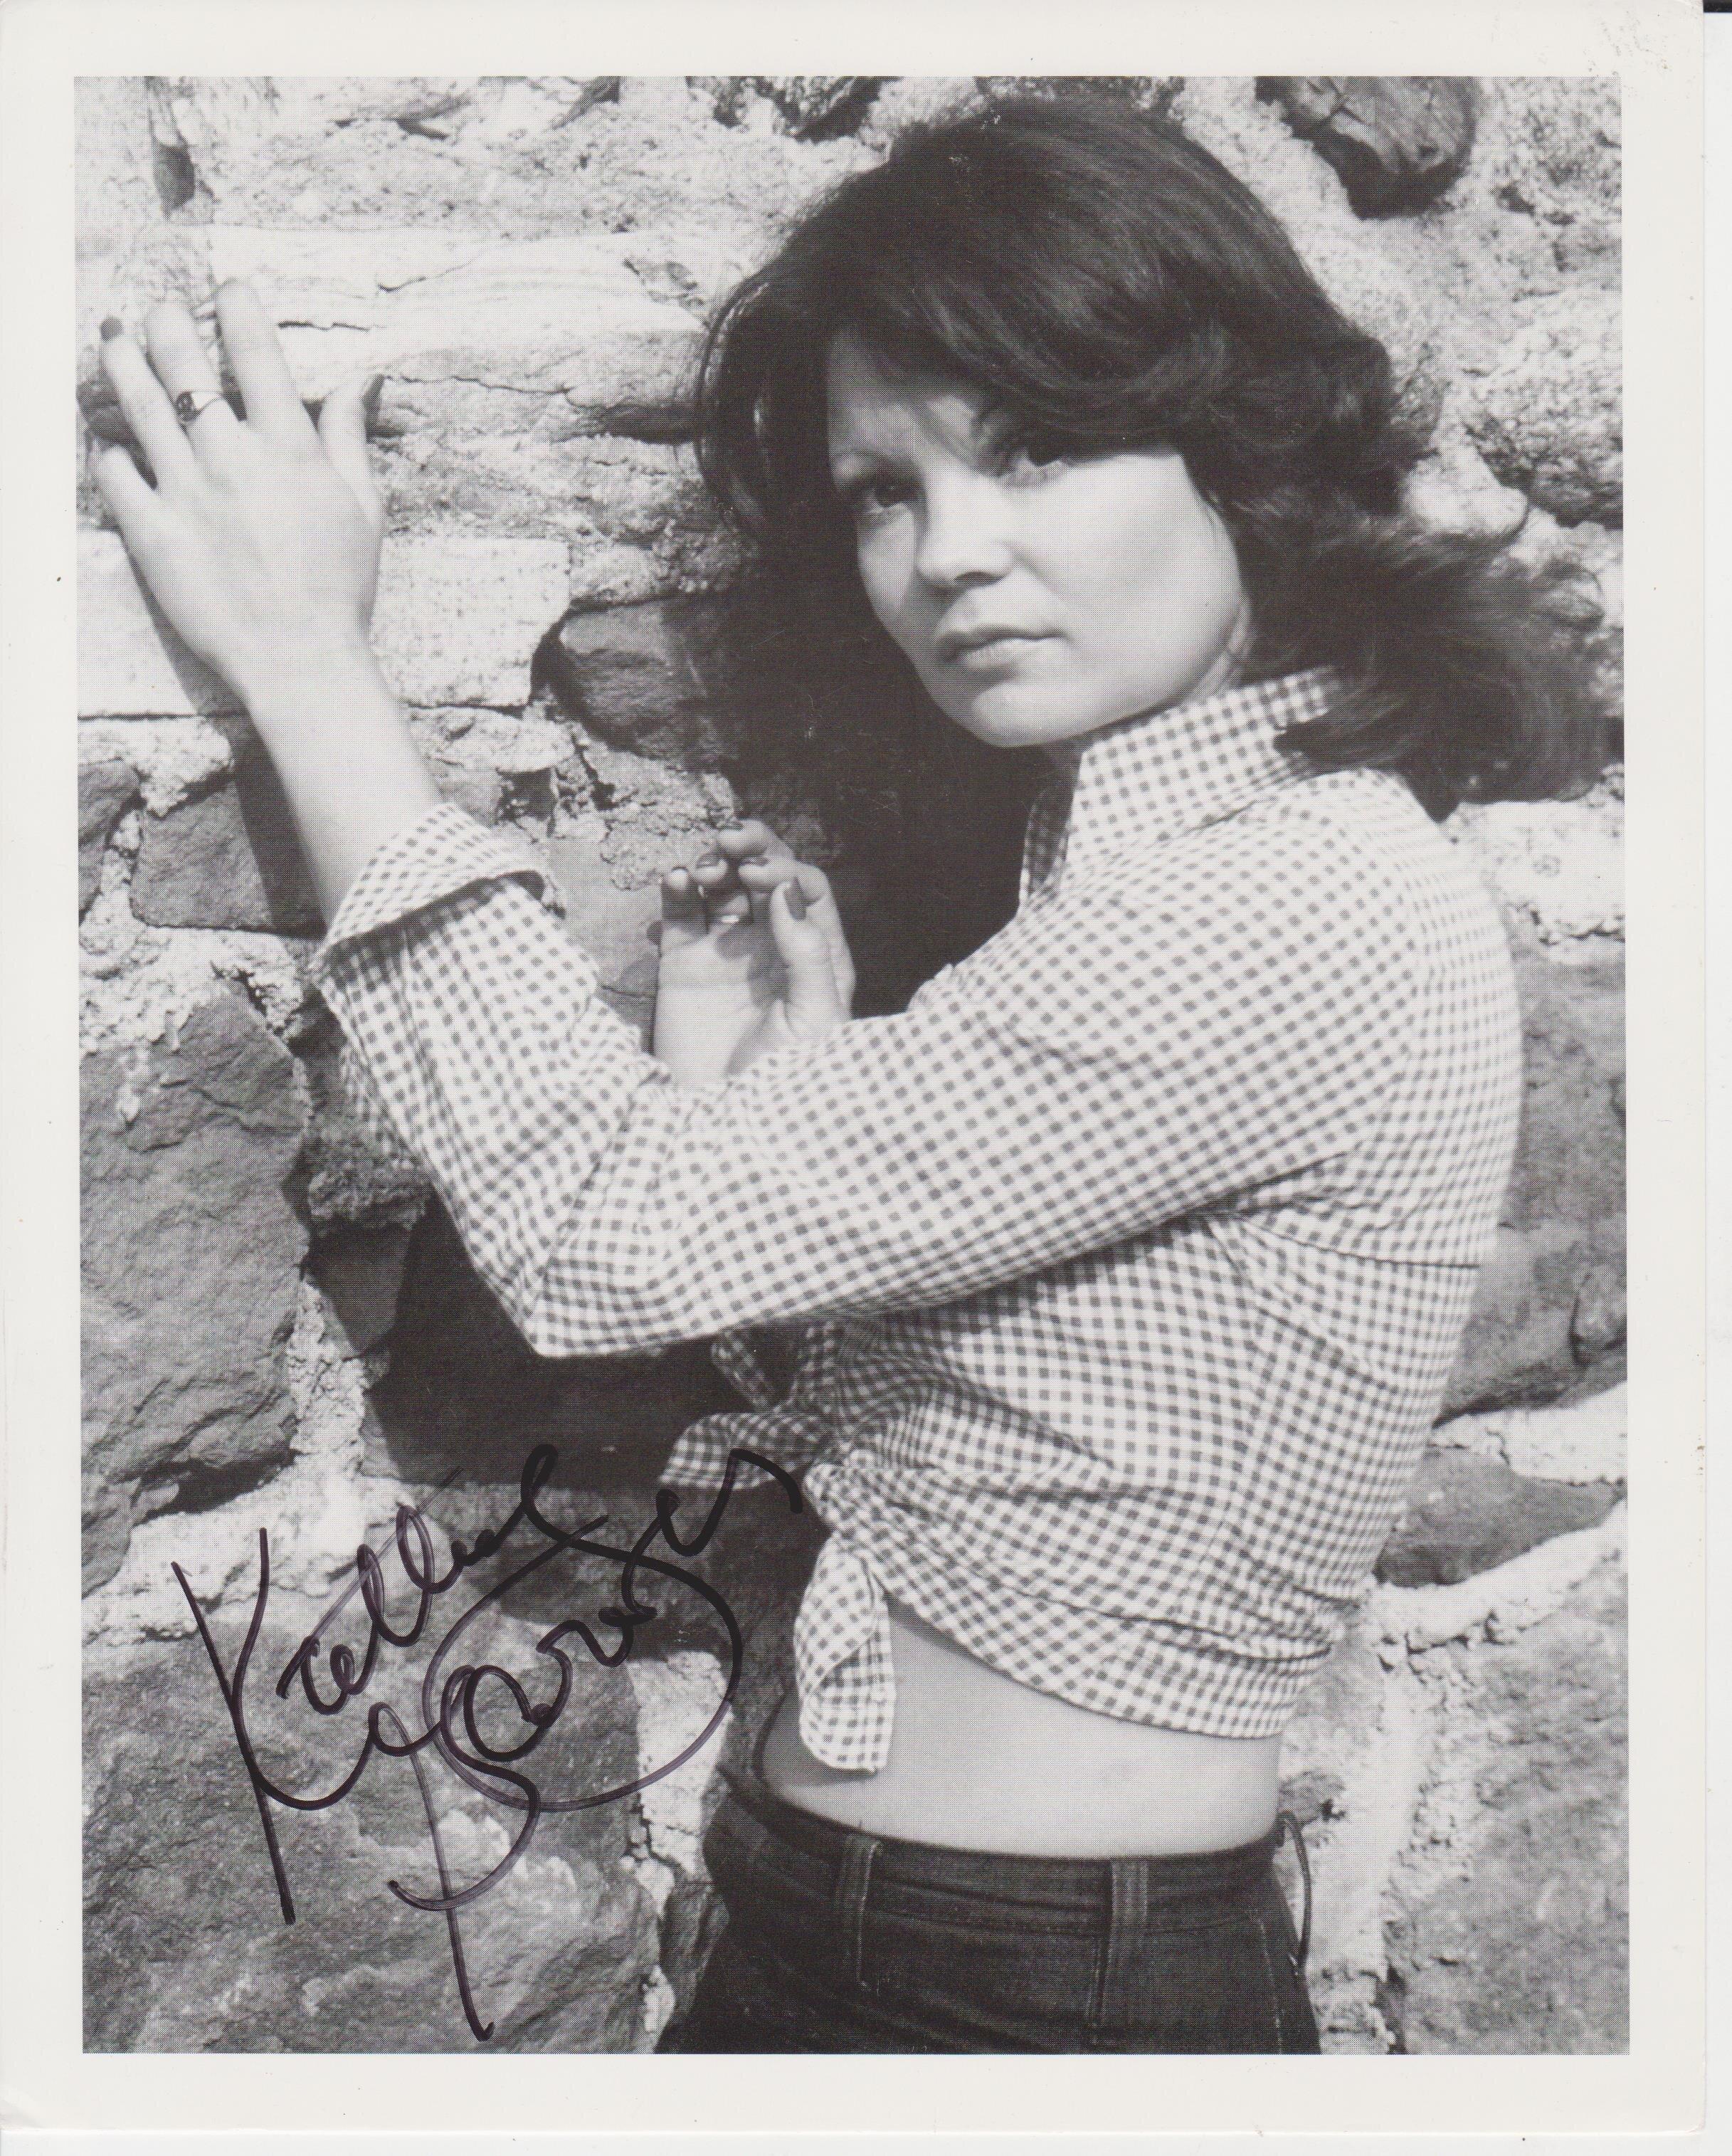 Ave Ninchi,Kitty Kallen Sex videos Melanie Chandra,Saori Horii (b. 1984)